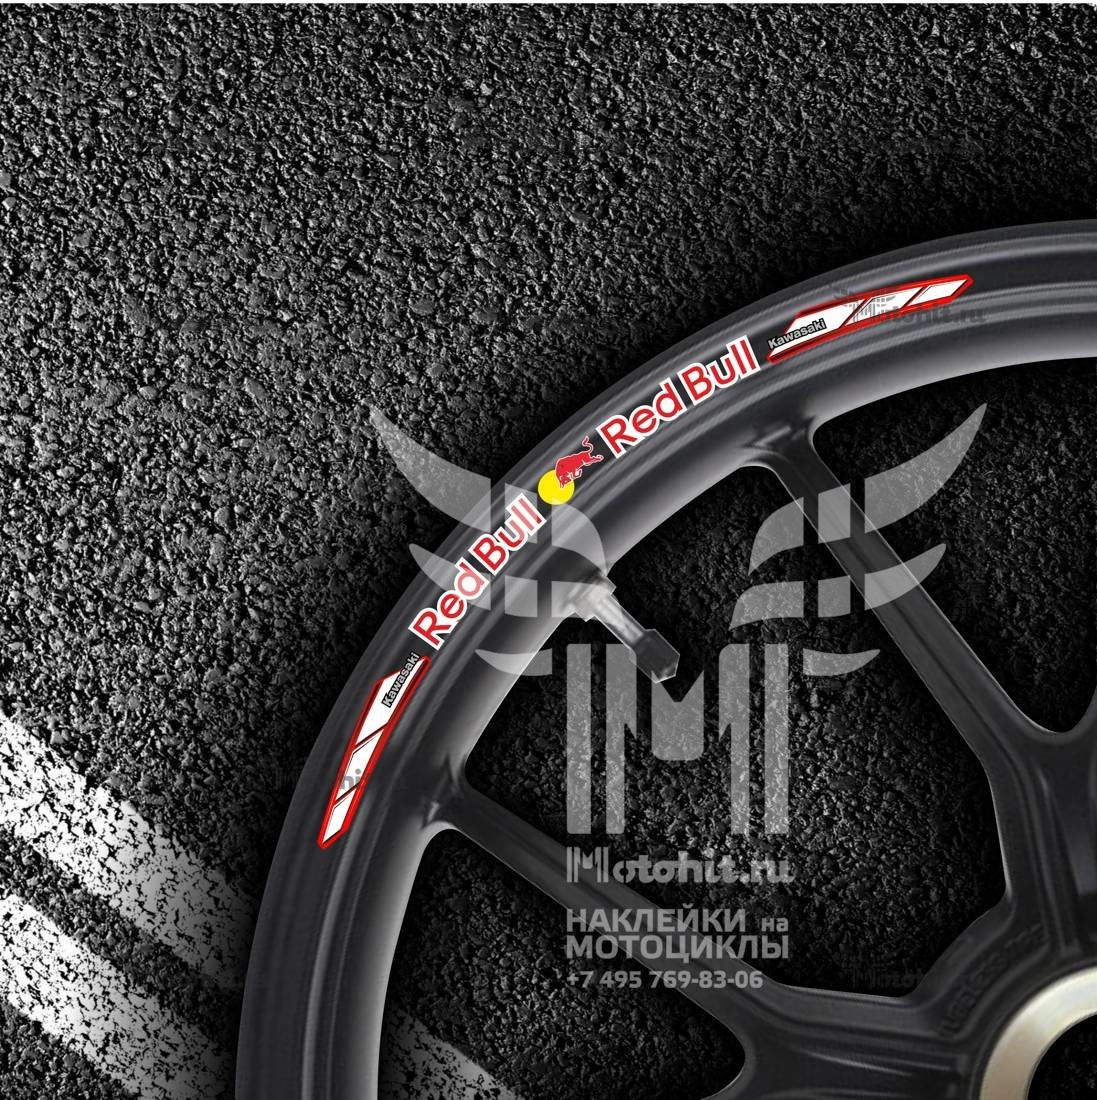 Комплект наклеек на обод колеса мотоцикла KAWASAKI RED-BULL